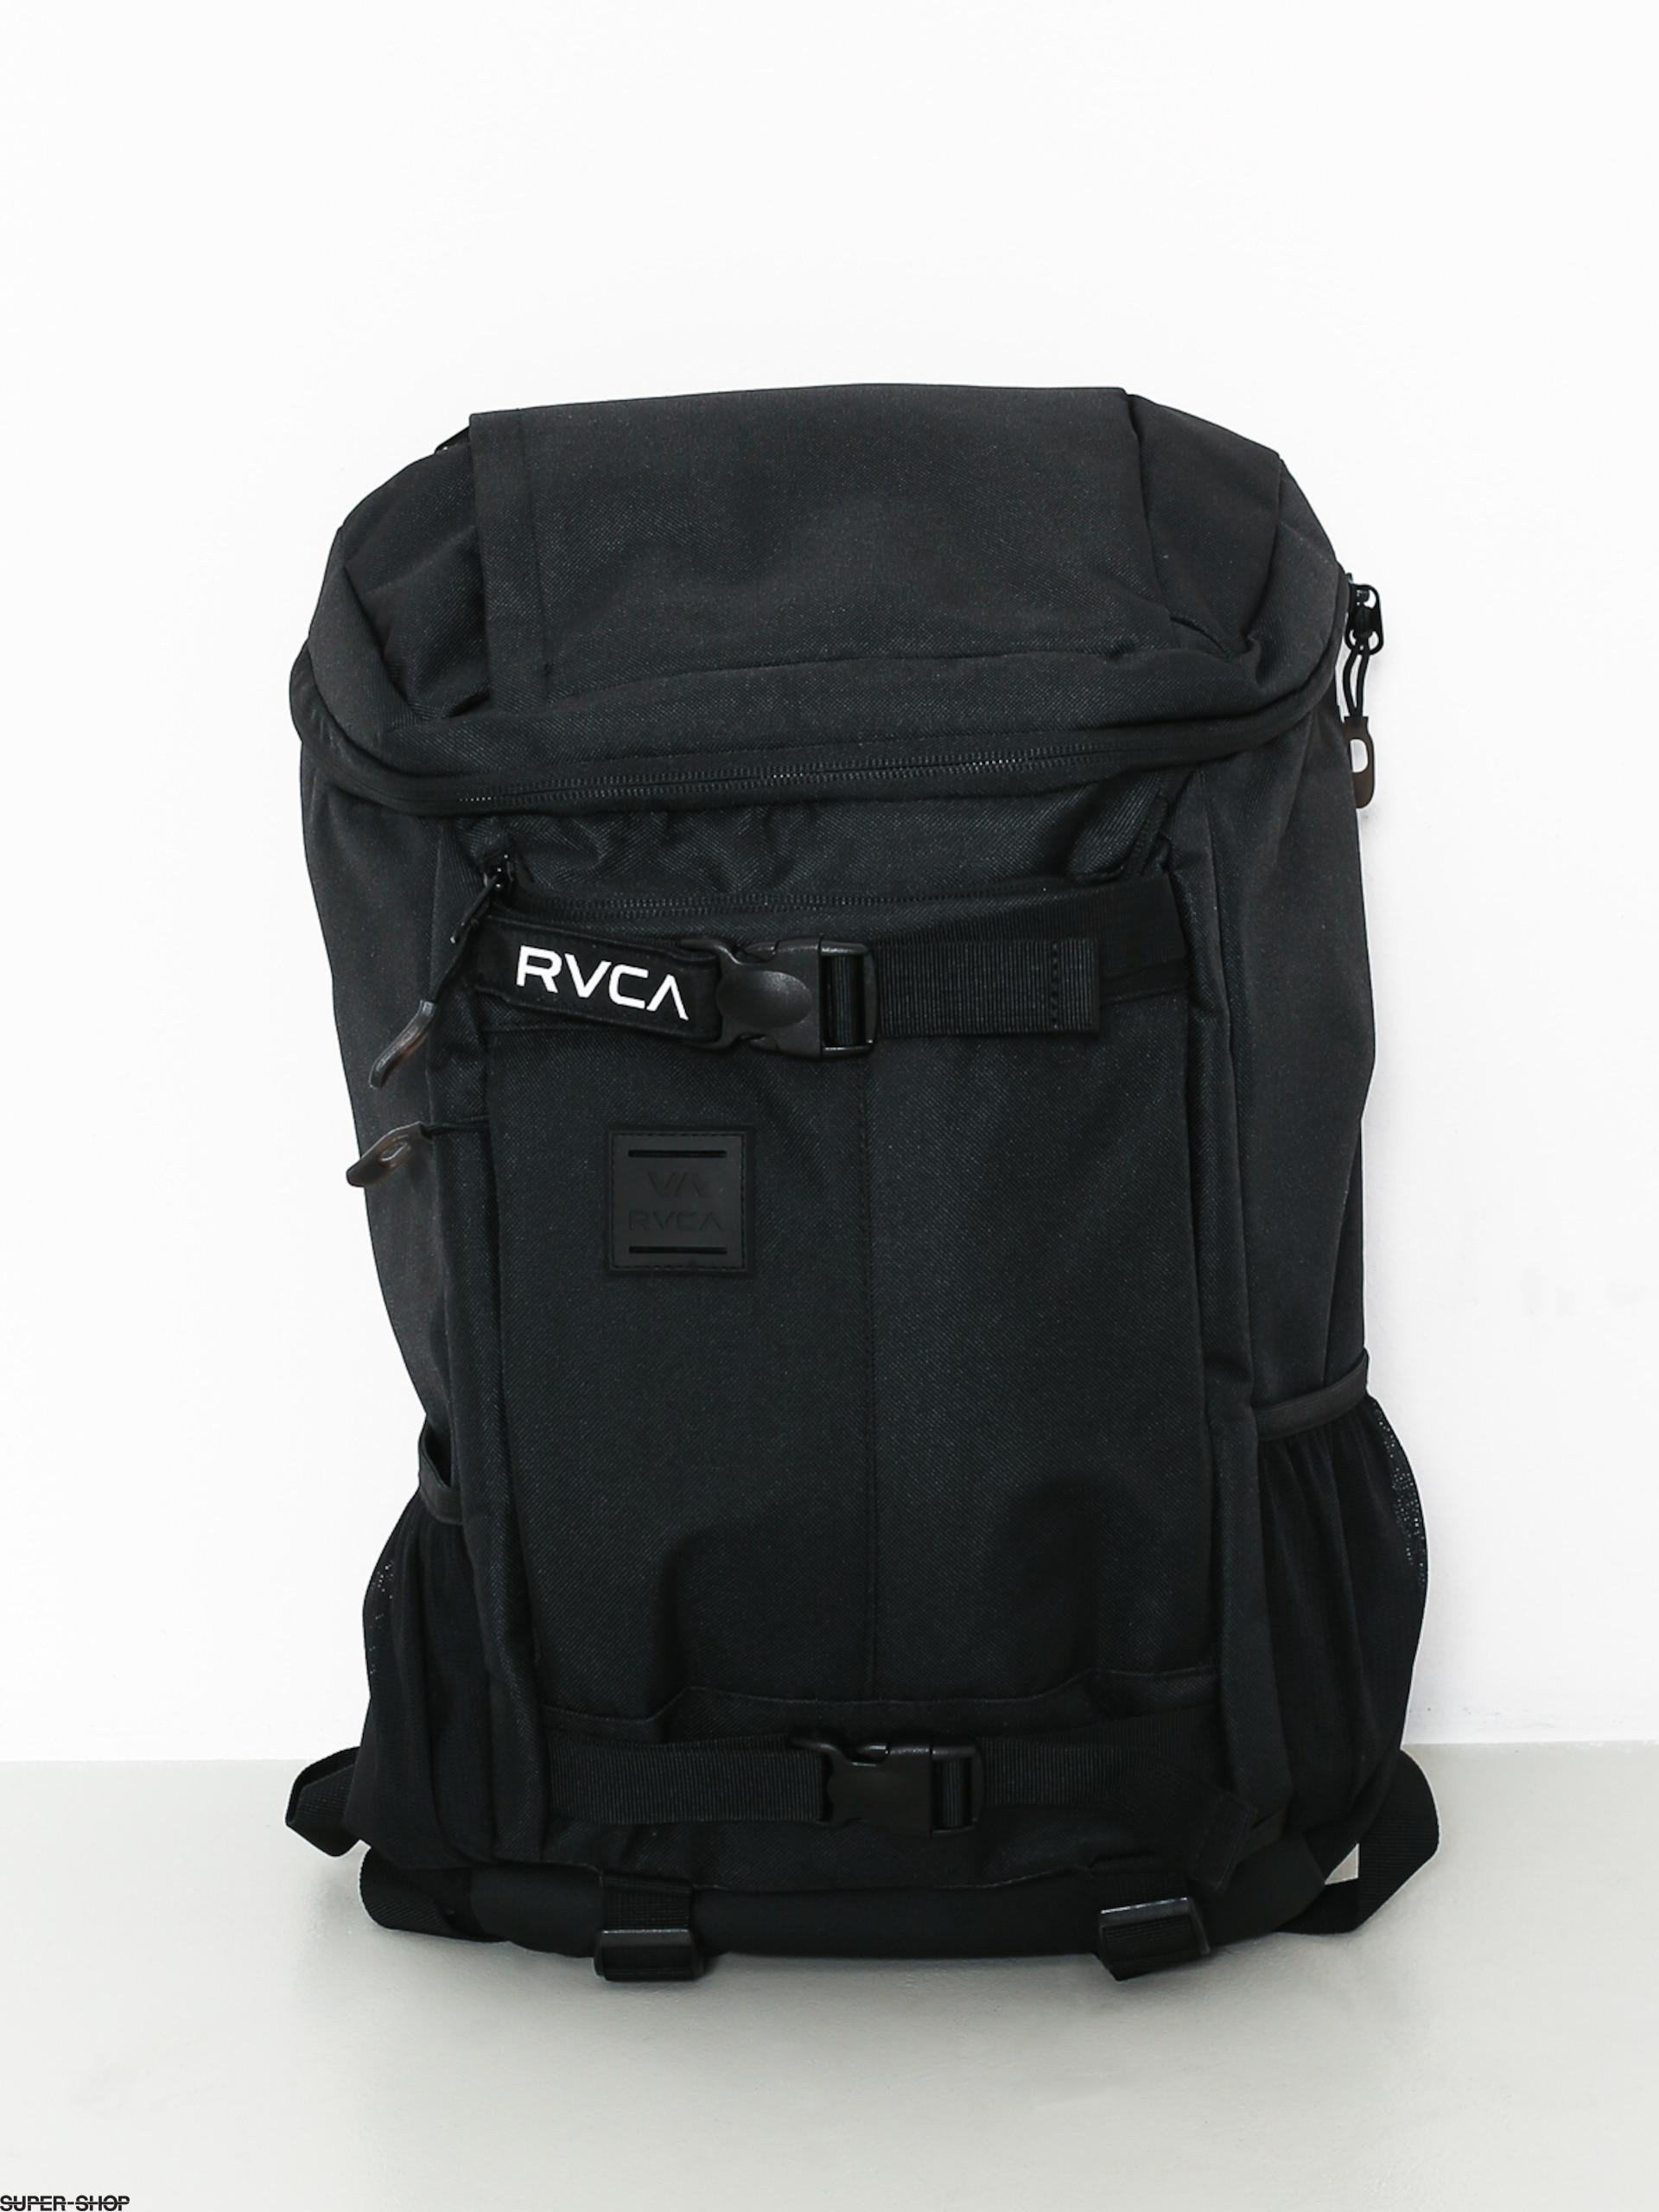 1008730-w1920-rvca-voyage-skate-backpack-black.jpg 1af6ee87fd765